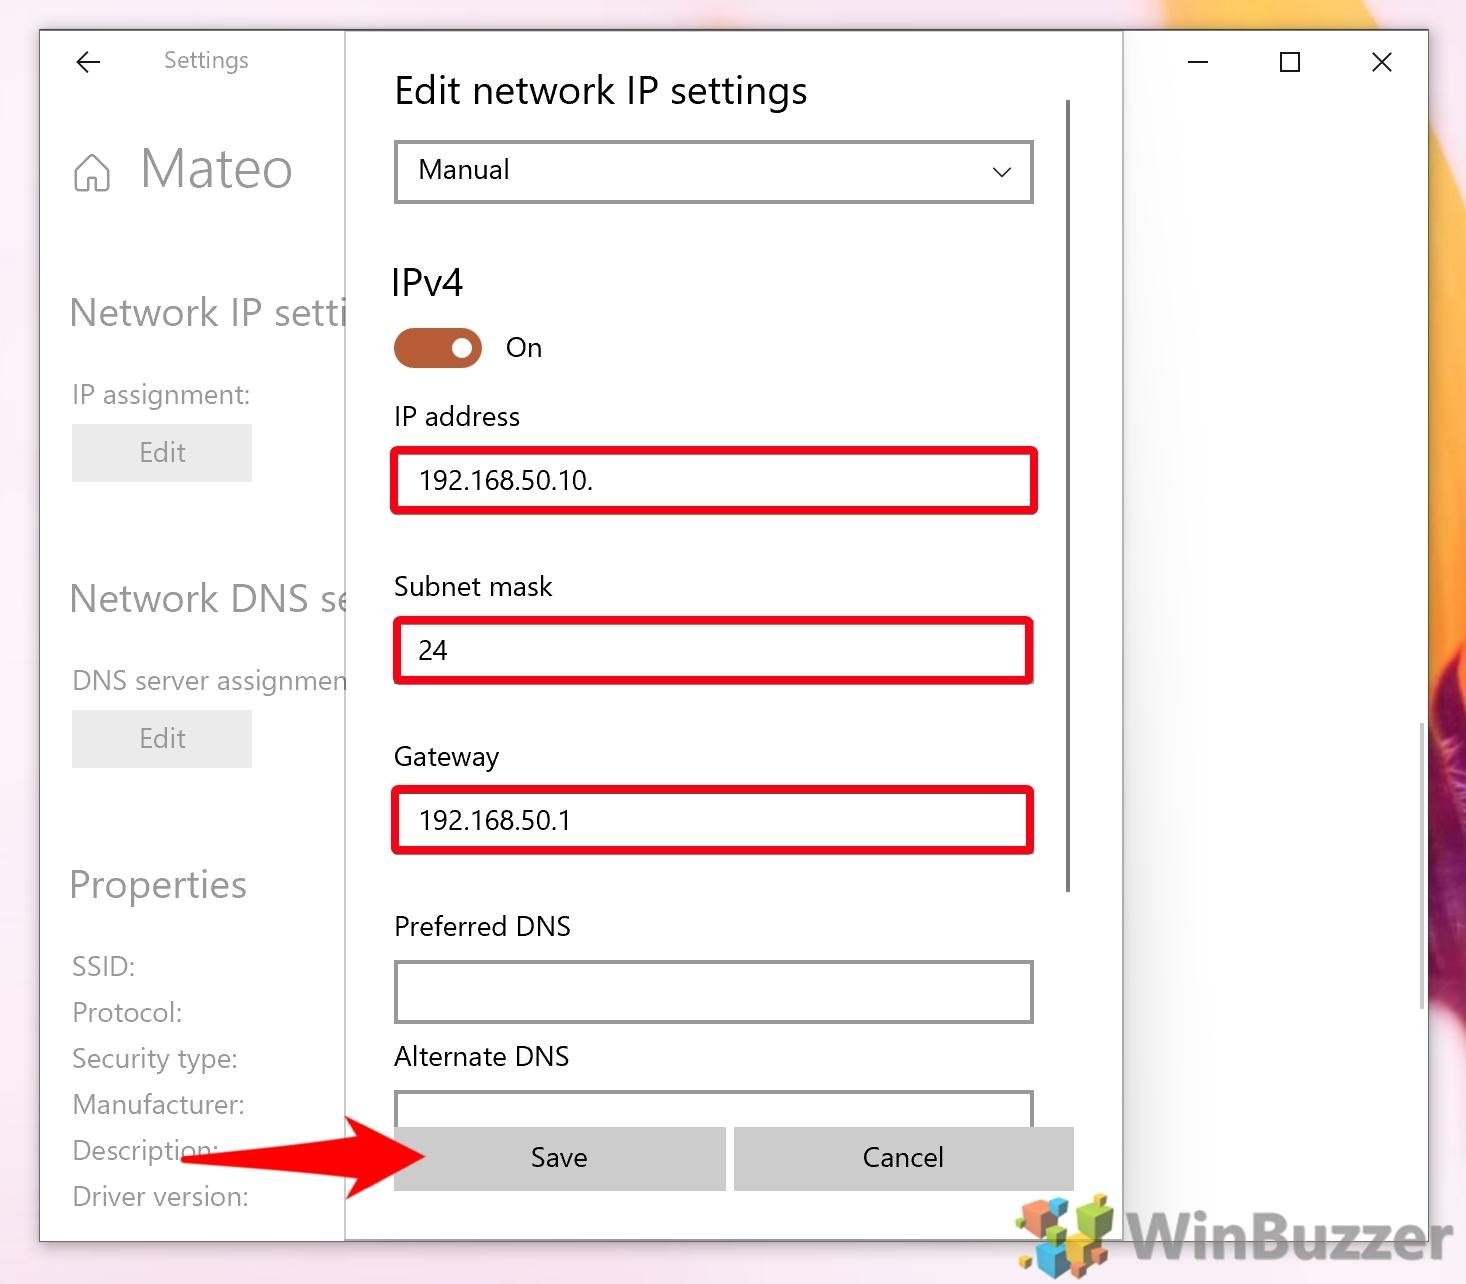 Windows 10 - Settings - Network & Internet - Wifi - Edit IP Assignment - Manual - Fill it